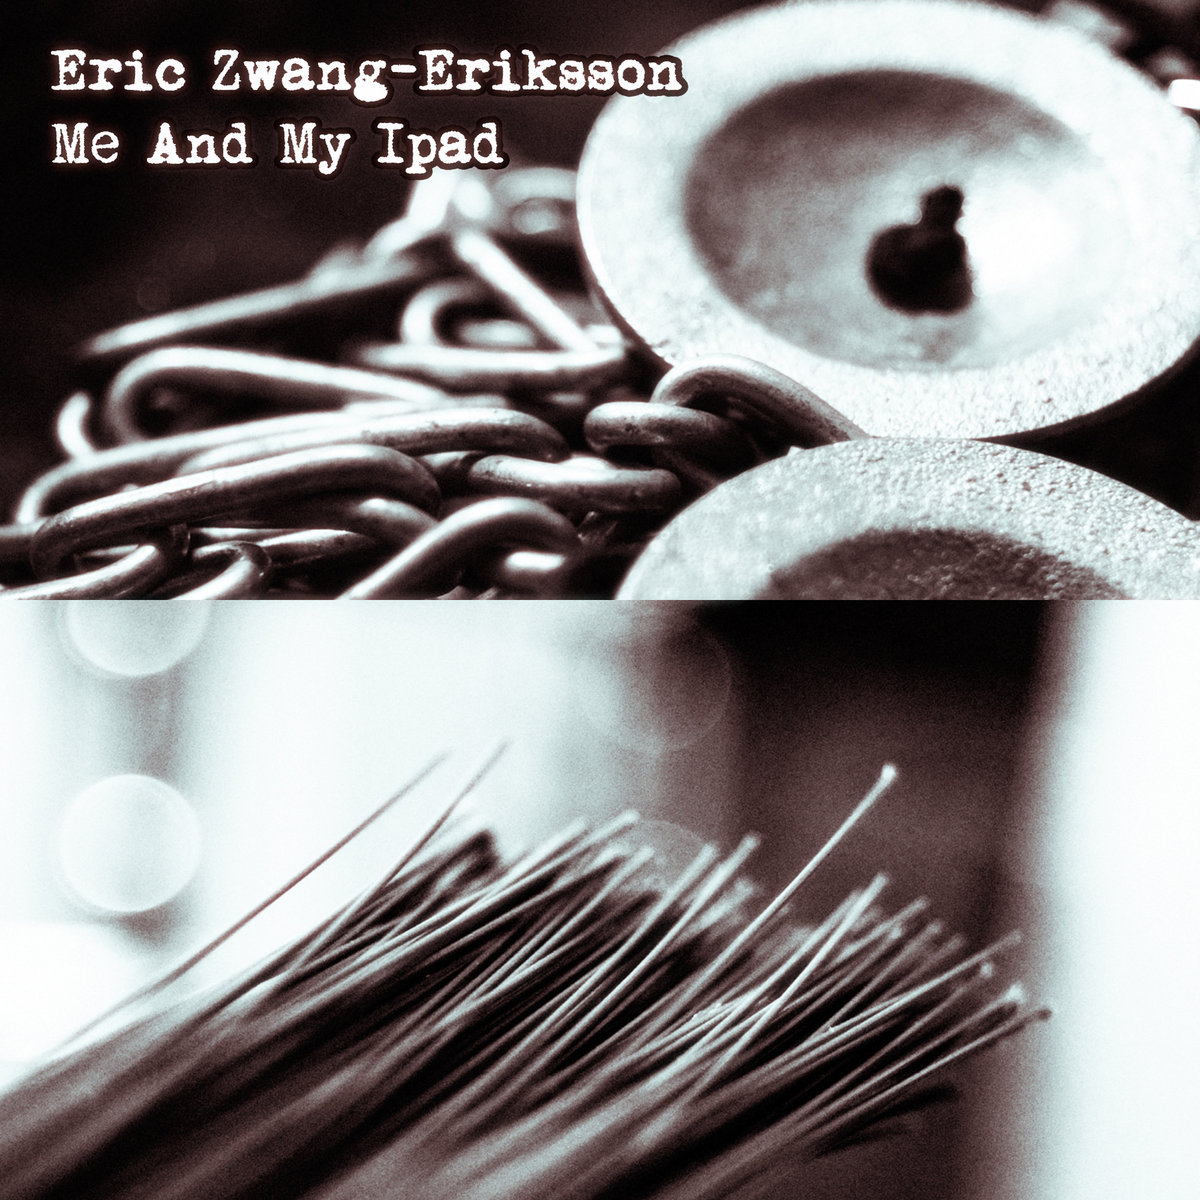 Eric Zwang-Eriksson – Me And My Ipad